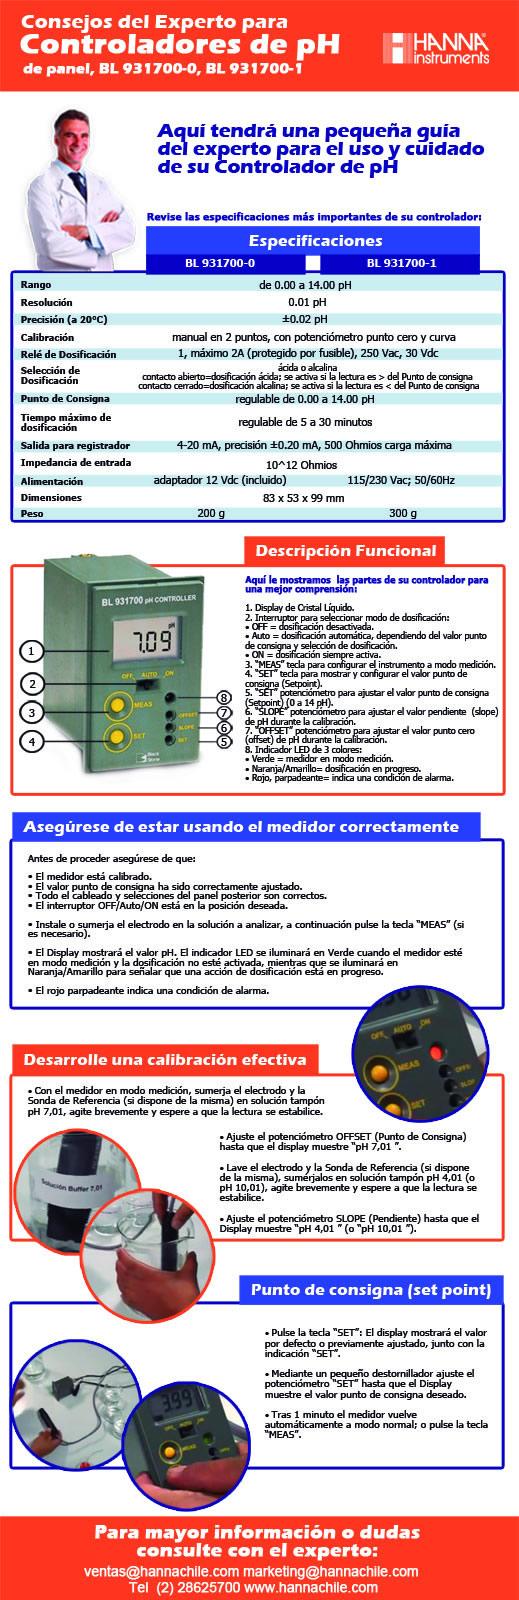 1126_2013-01-16-consejos-controladores